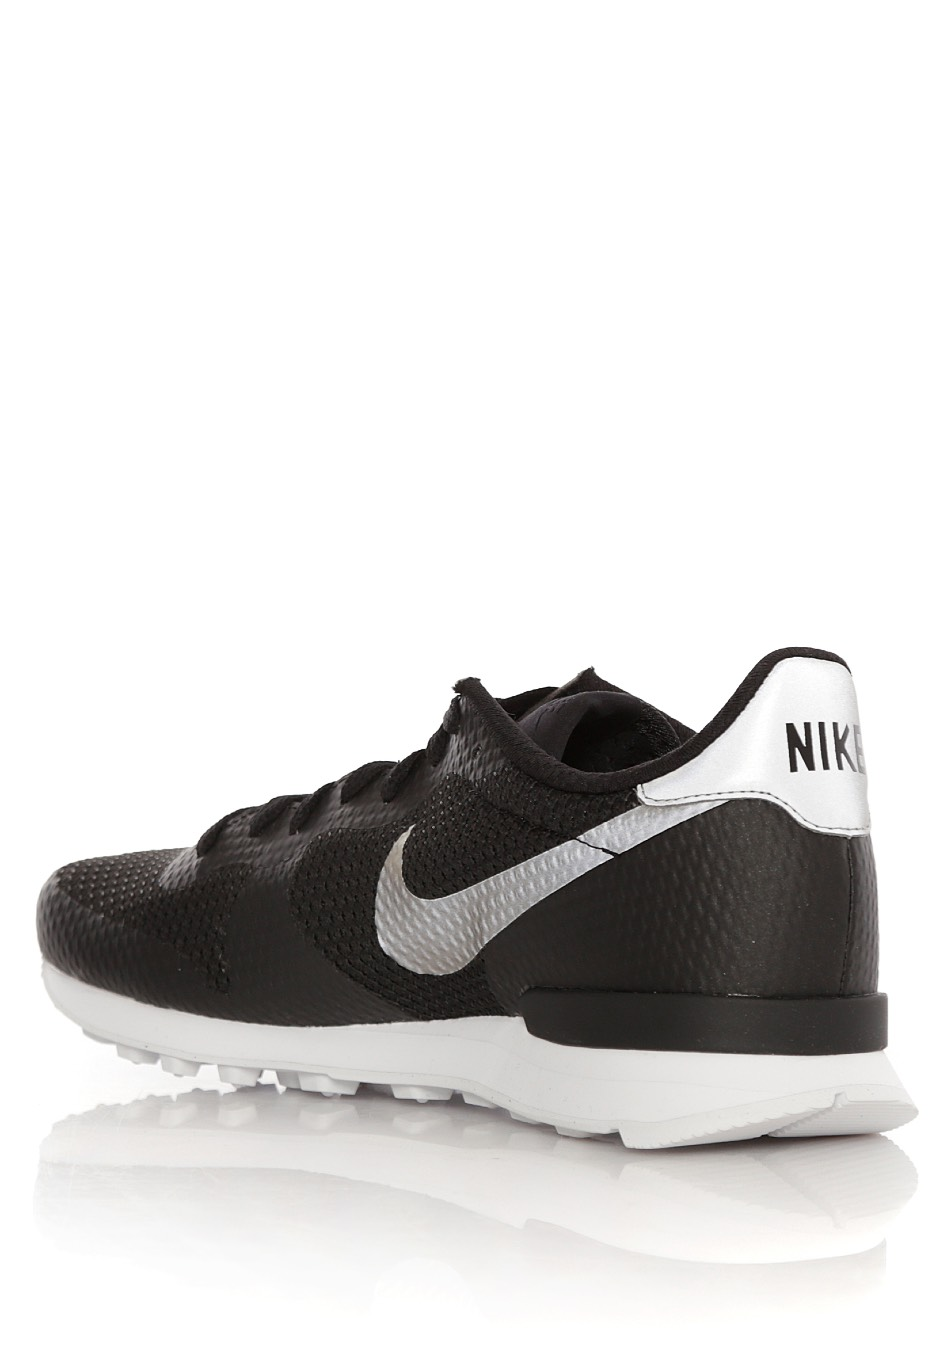 Click [ESC] to close the window. Nike - Internationalist NS ...